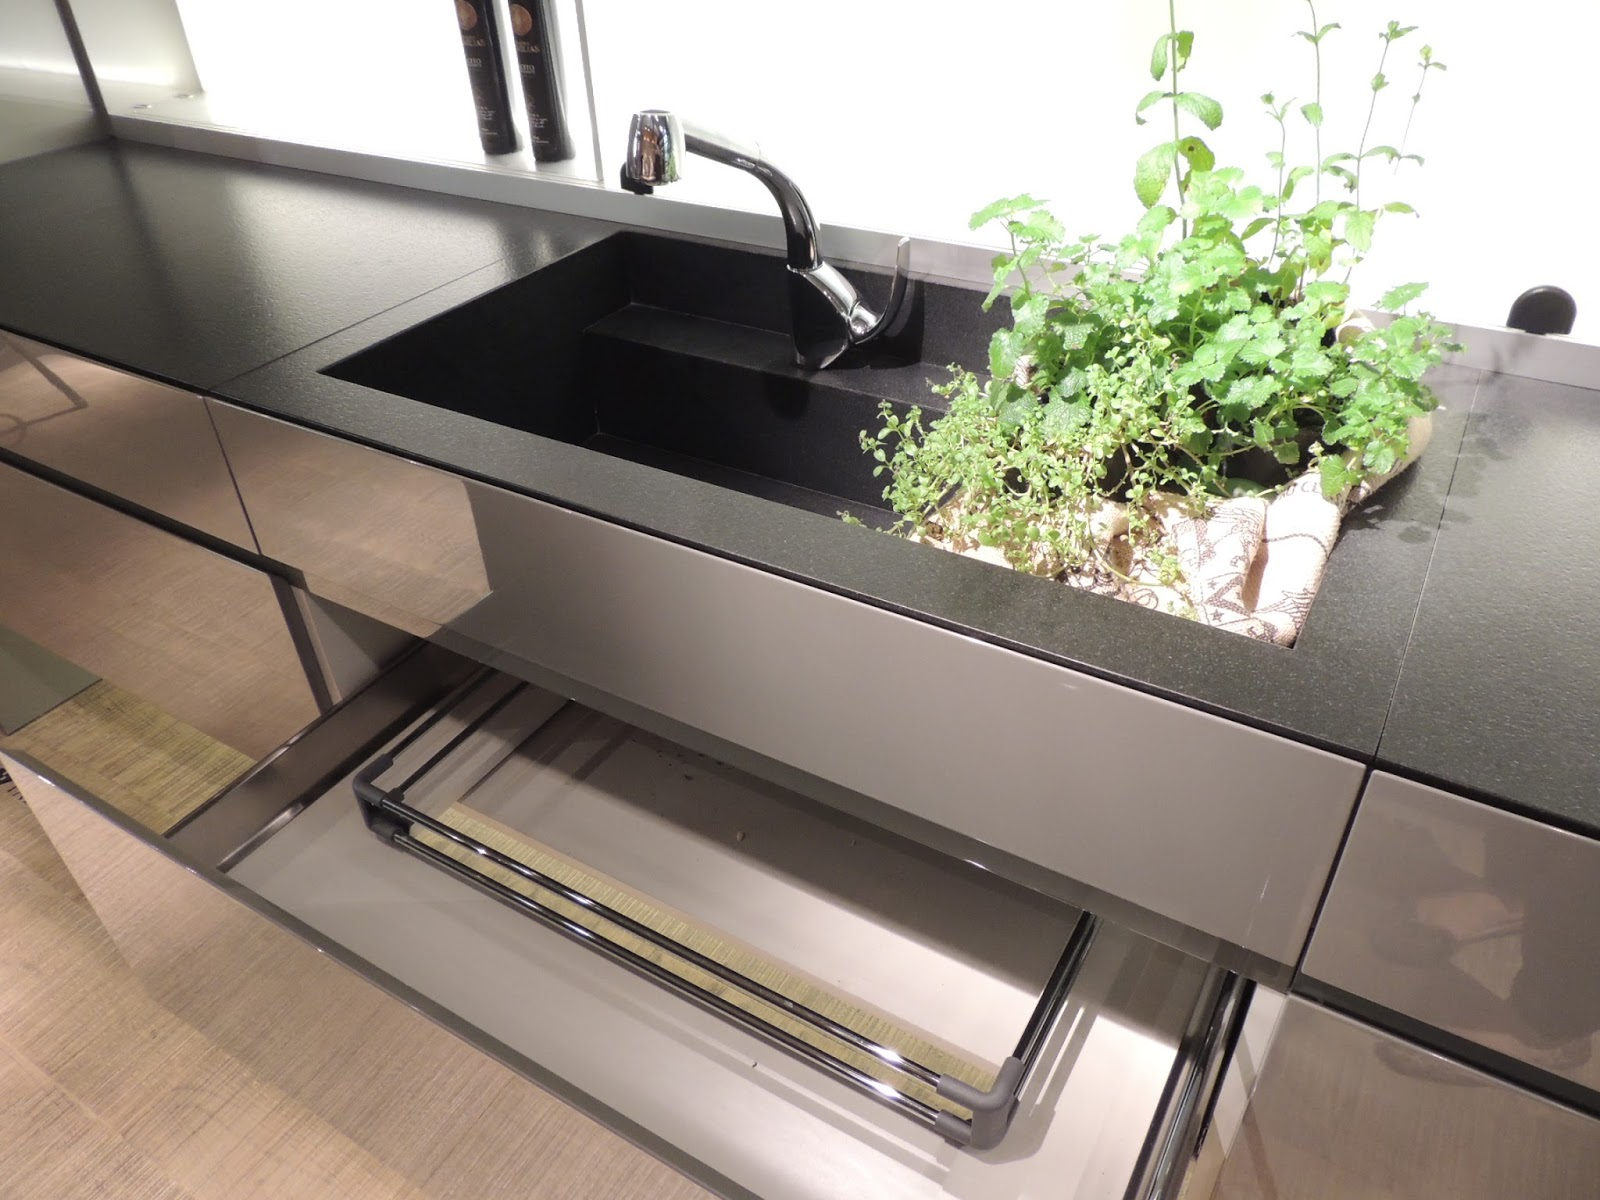 Design insider cocinas foa - Granito sin pulir ...